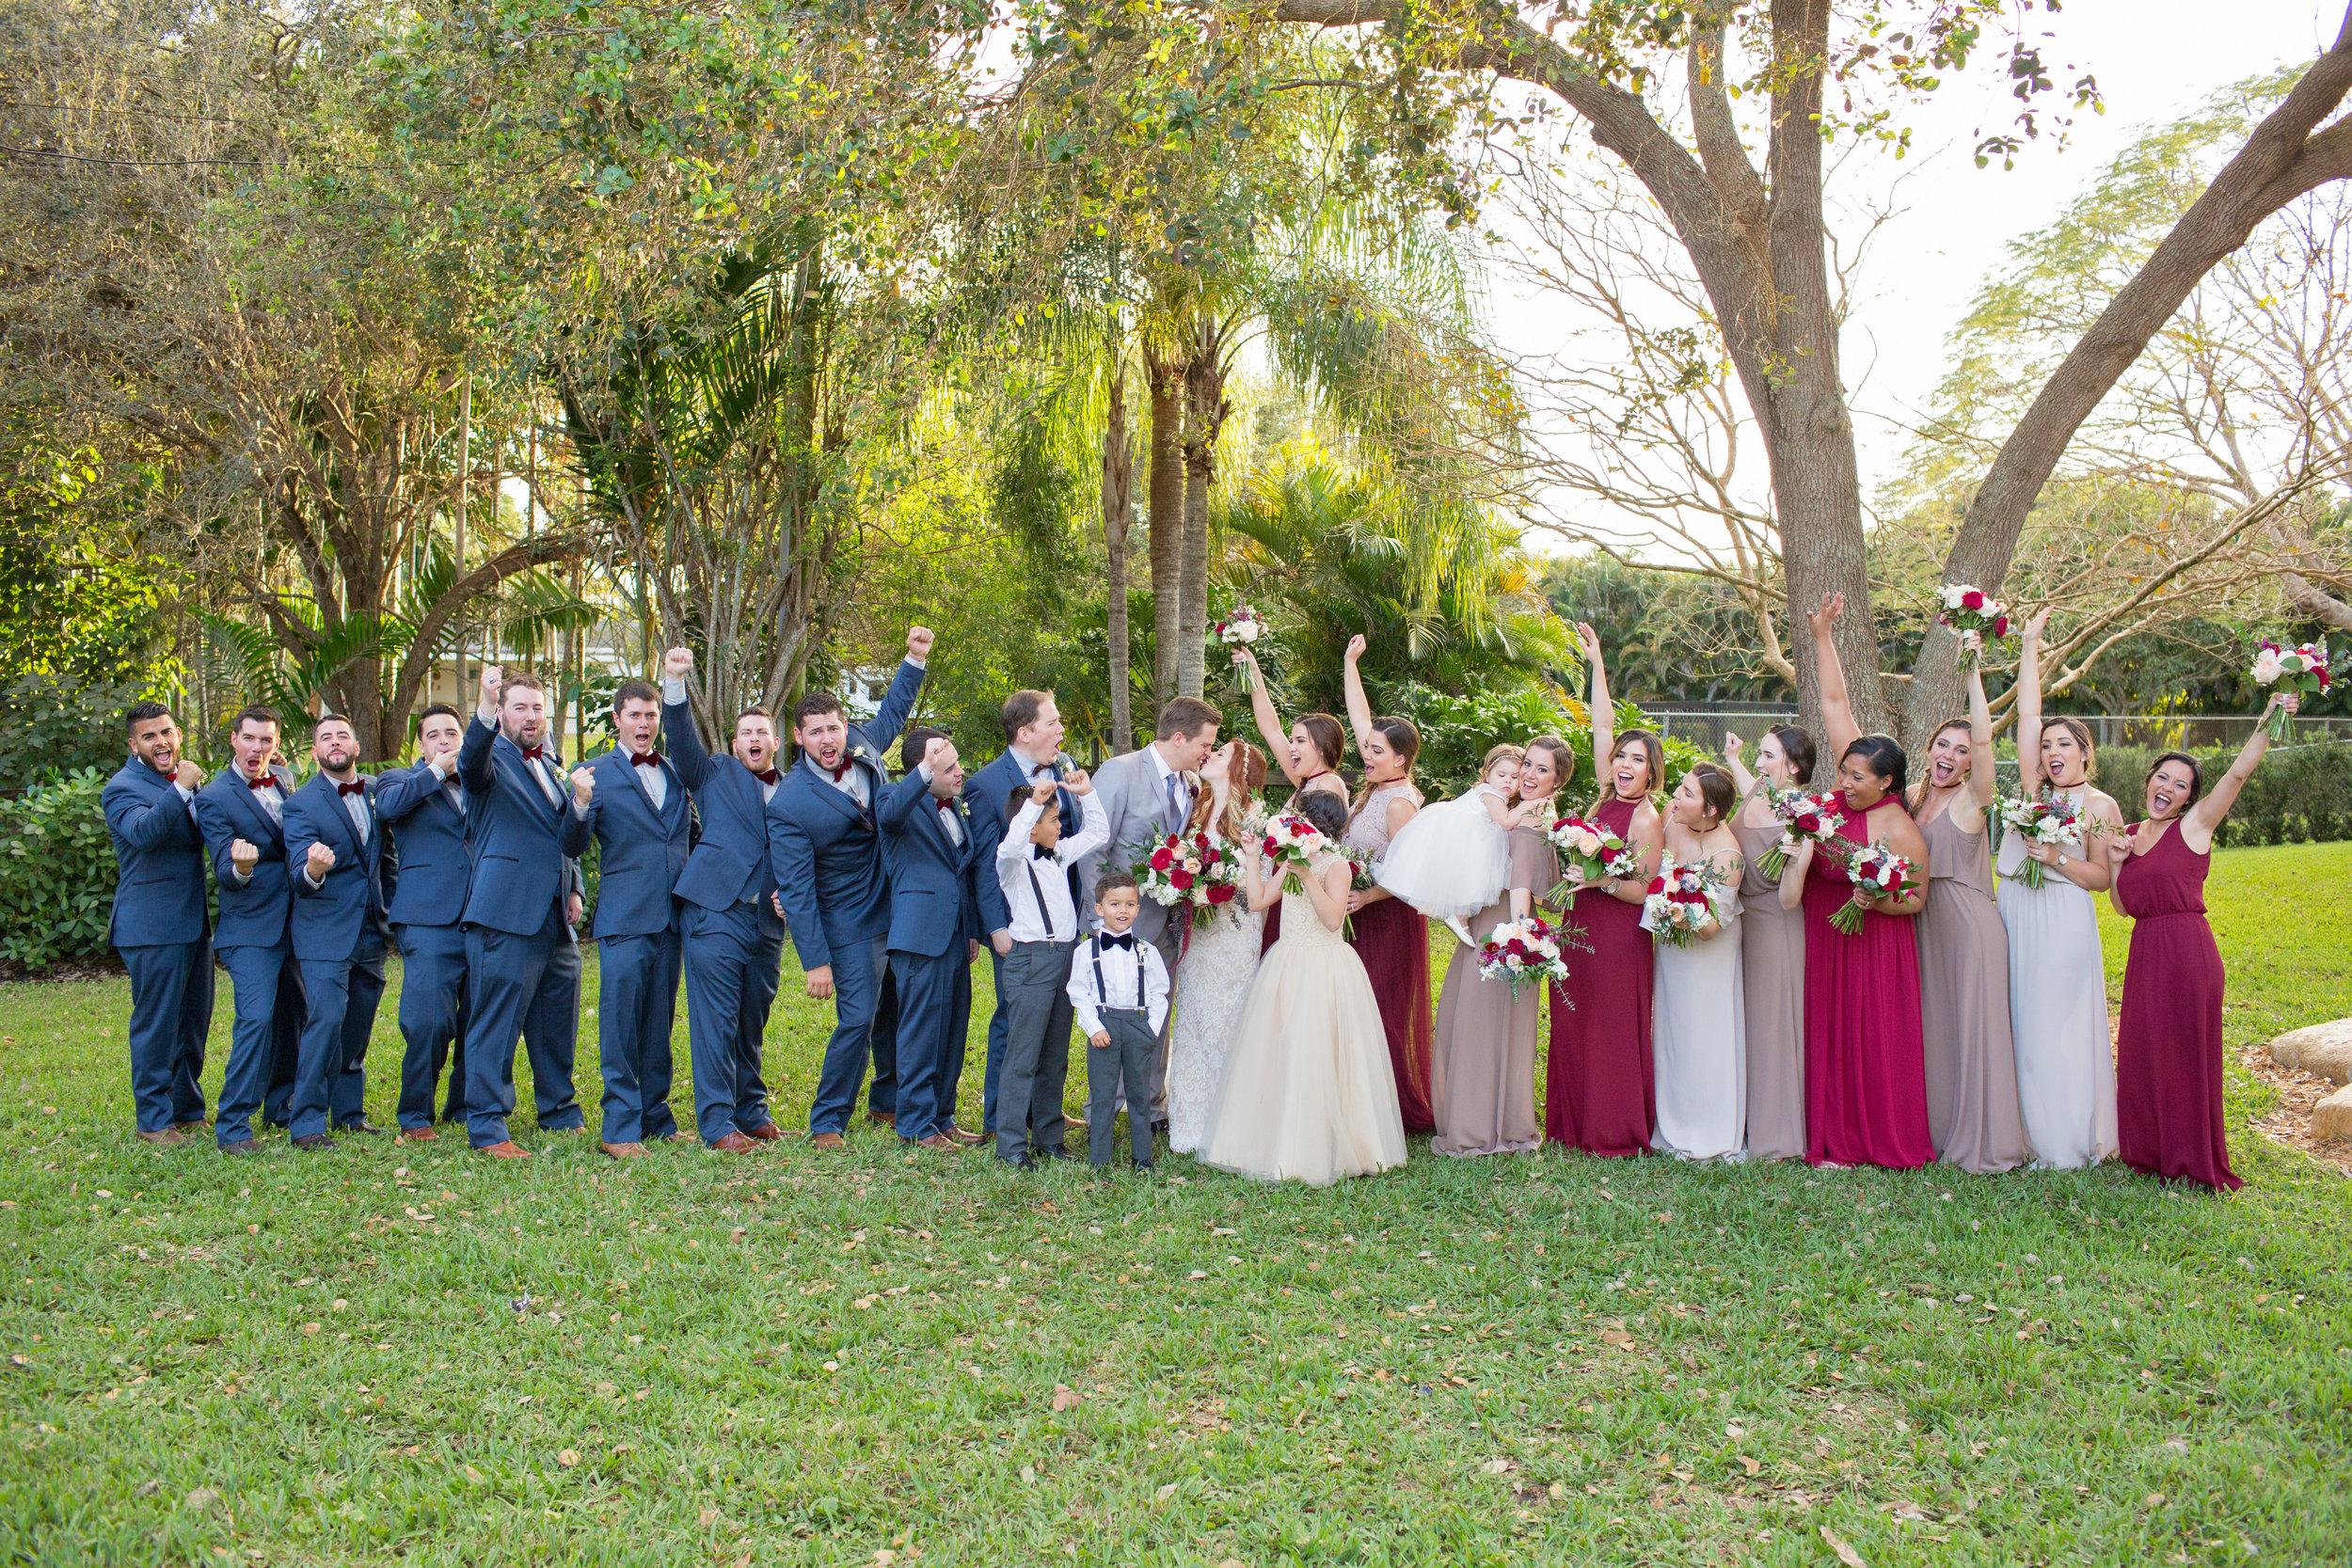 Ringger Wedding-HIGH RESOLUTION IMAGES-0424.jpg